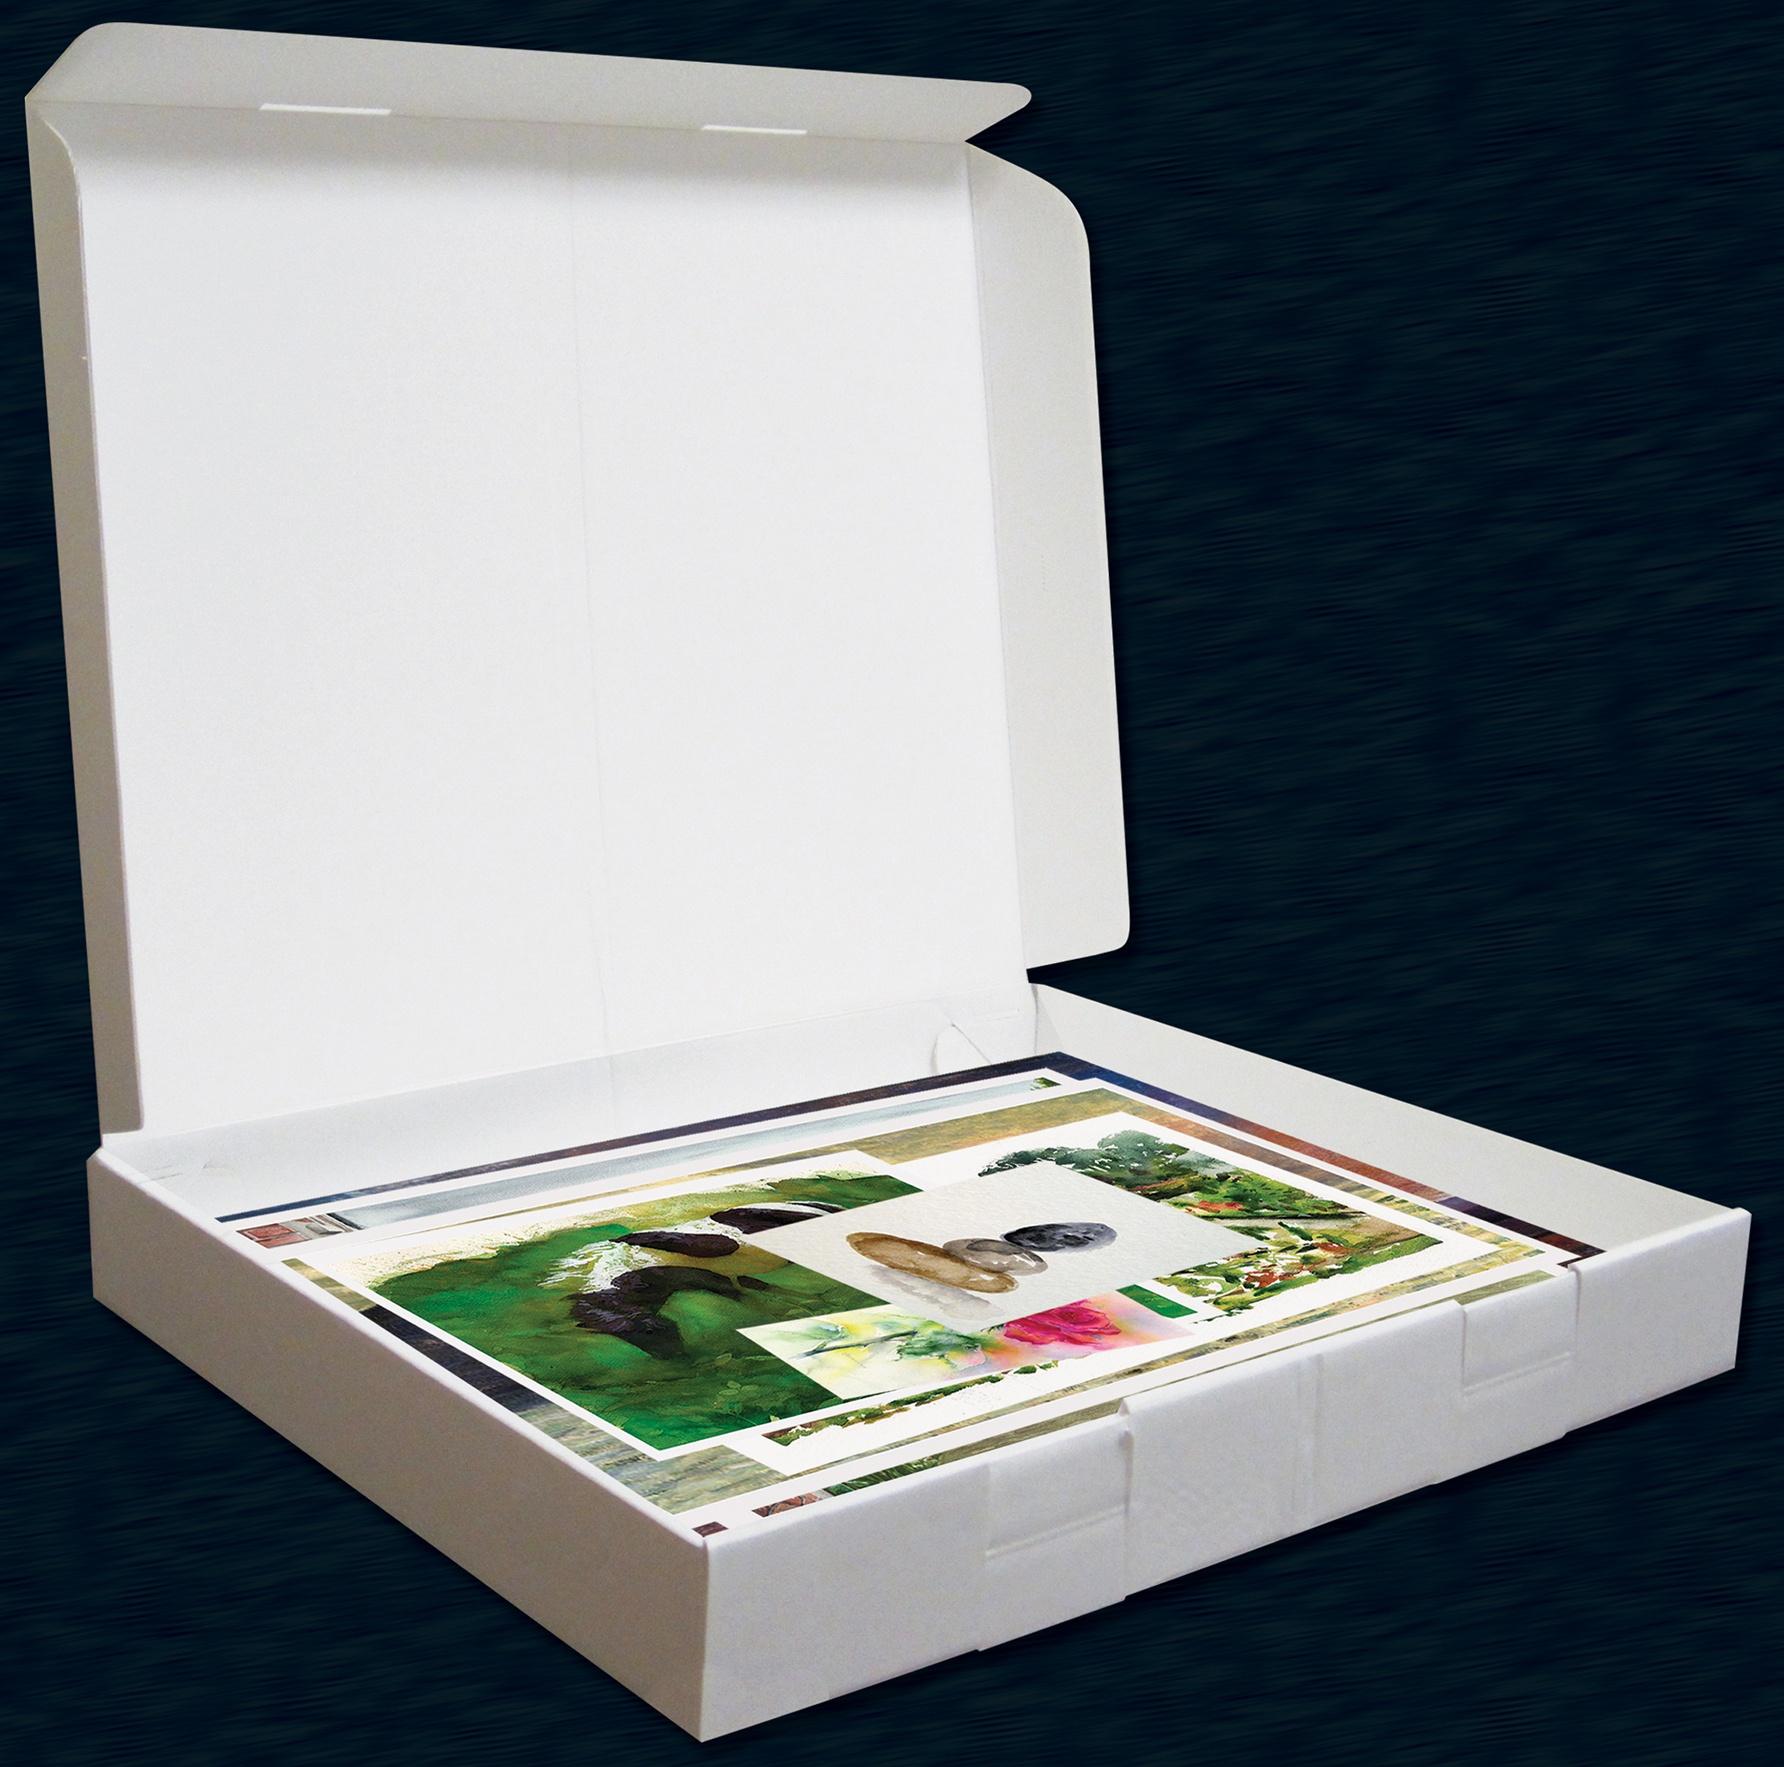 PROP-IT Storage Box 11x14x1.5-Medium